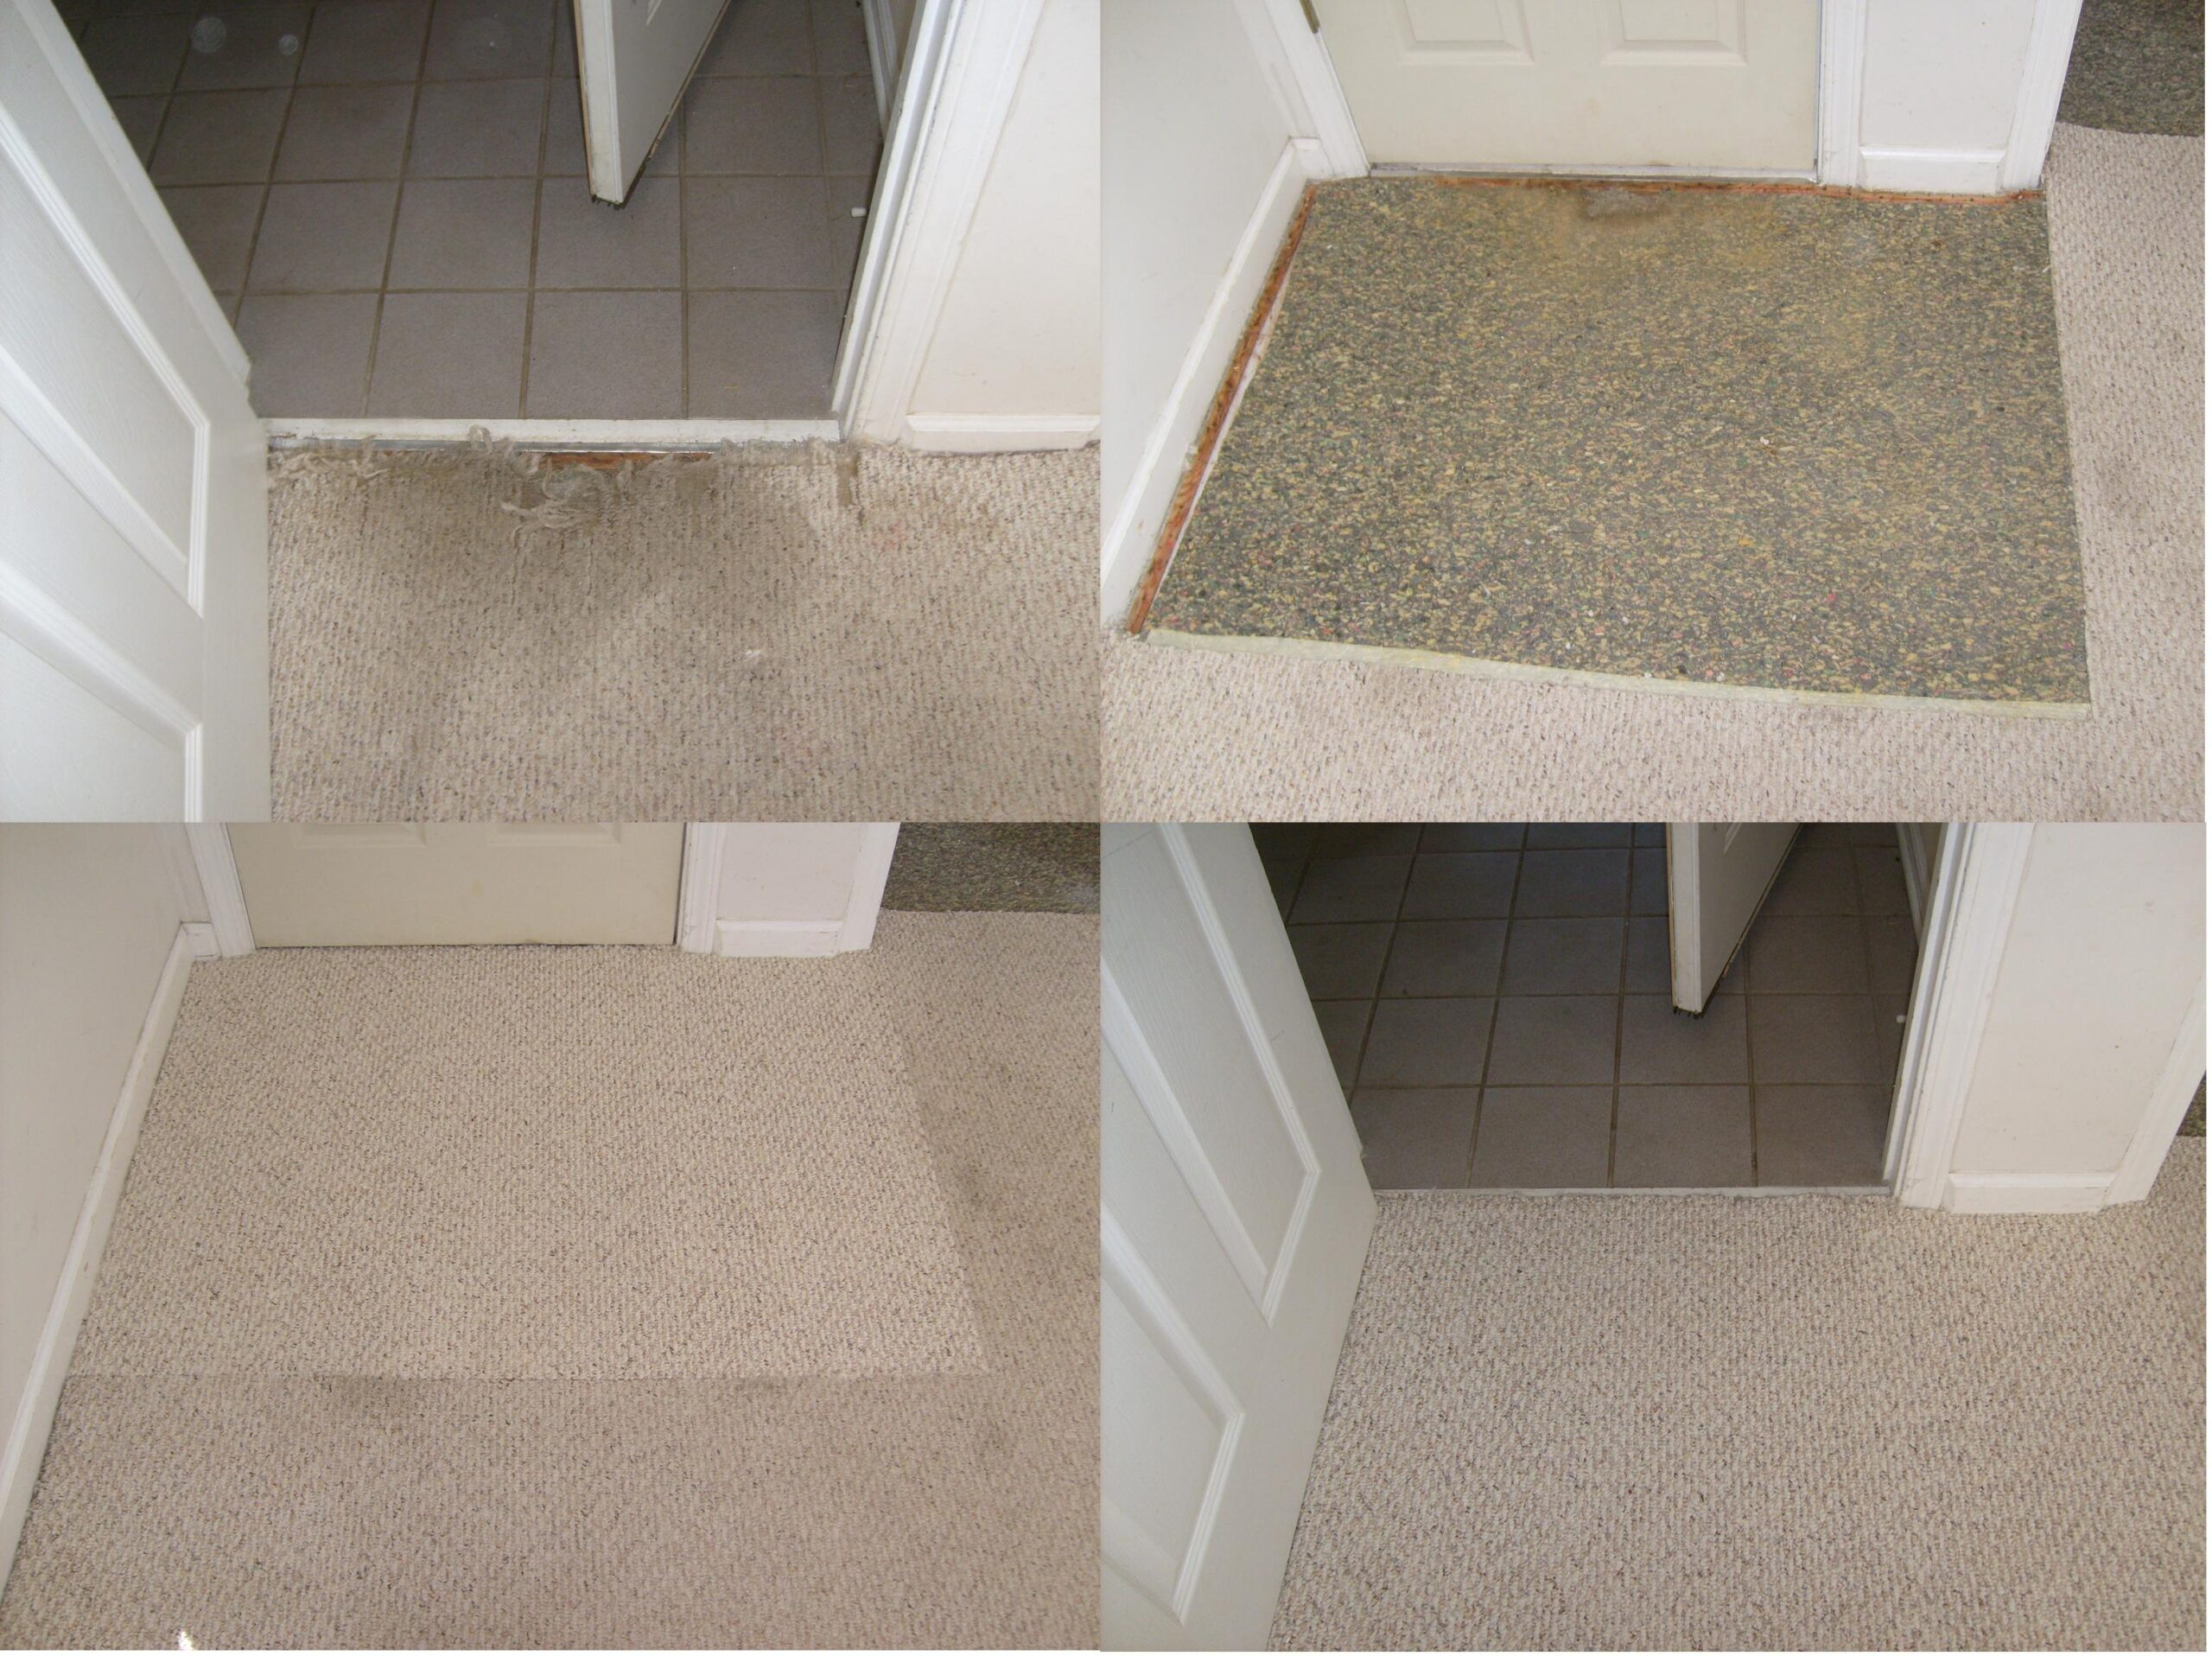 Carpet repair threshold pet damage 4 pic